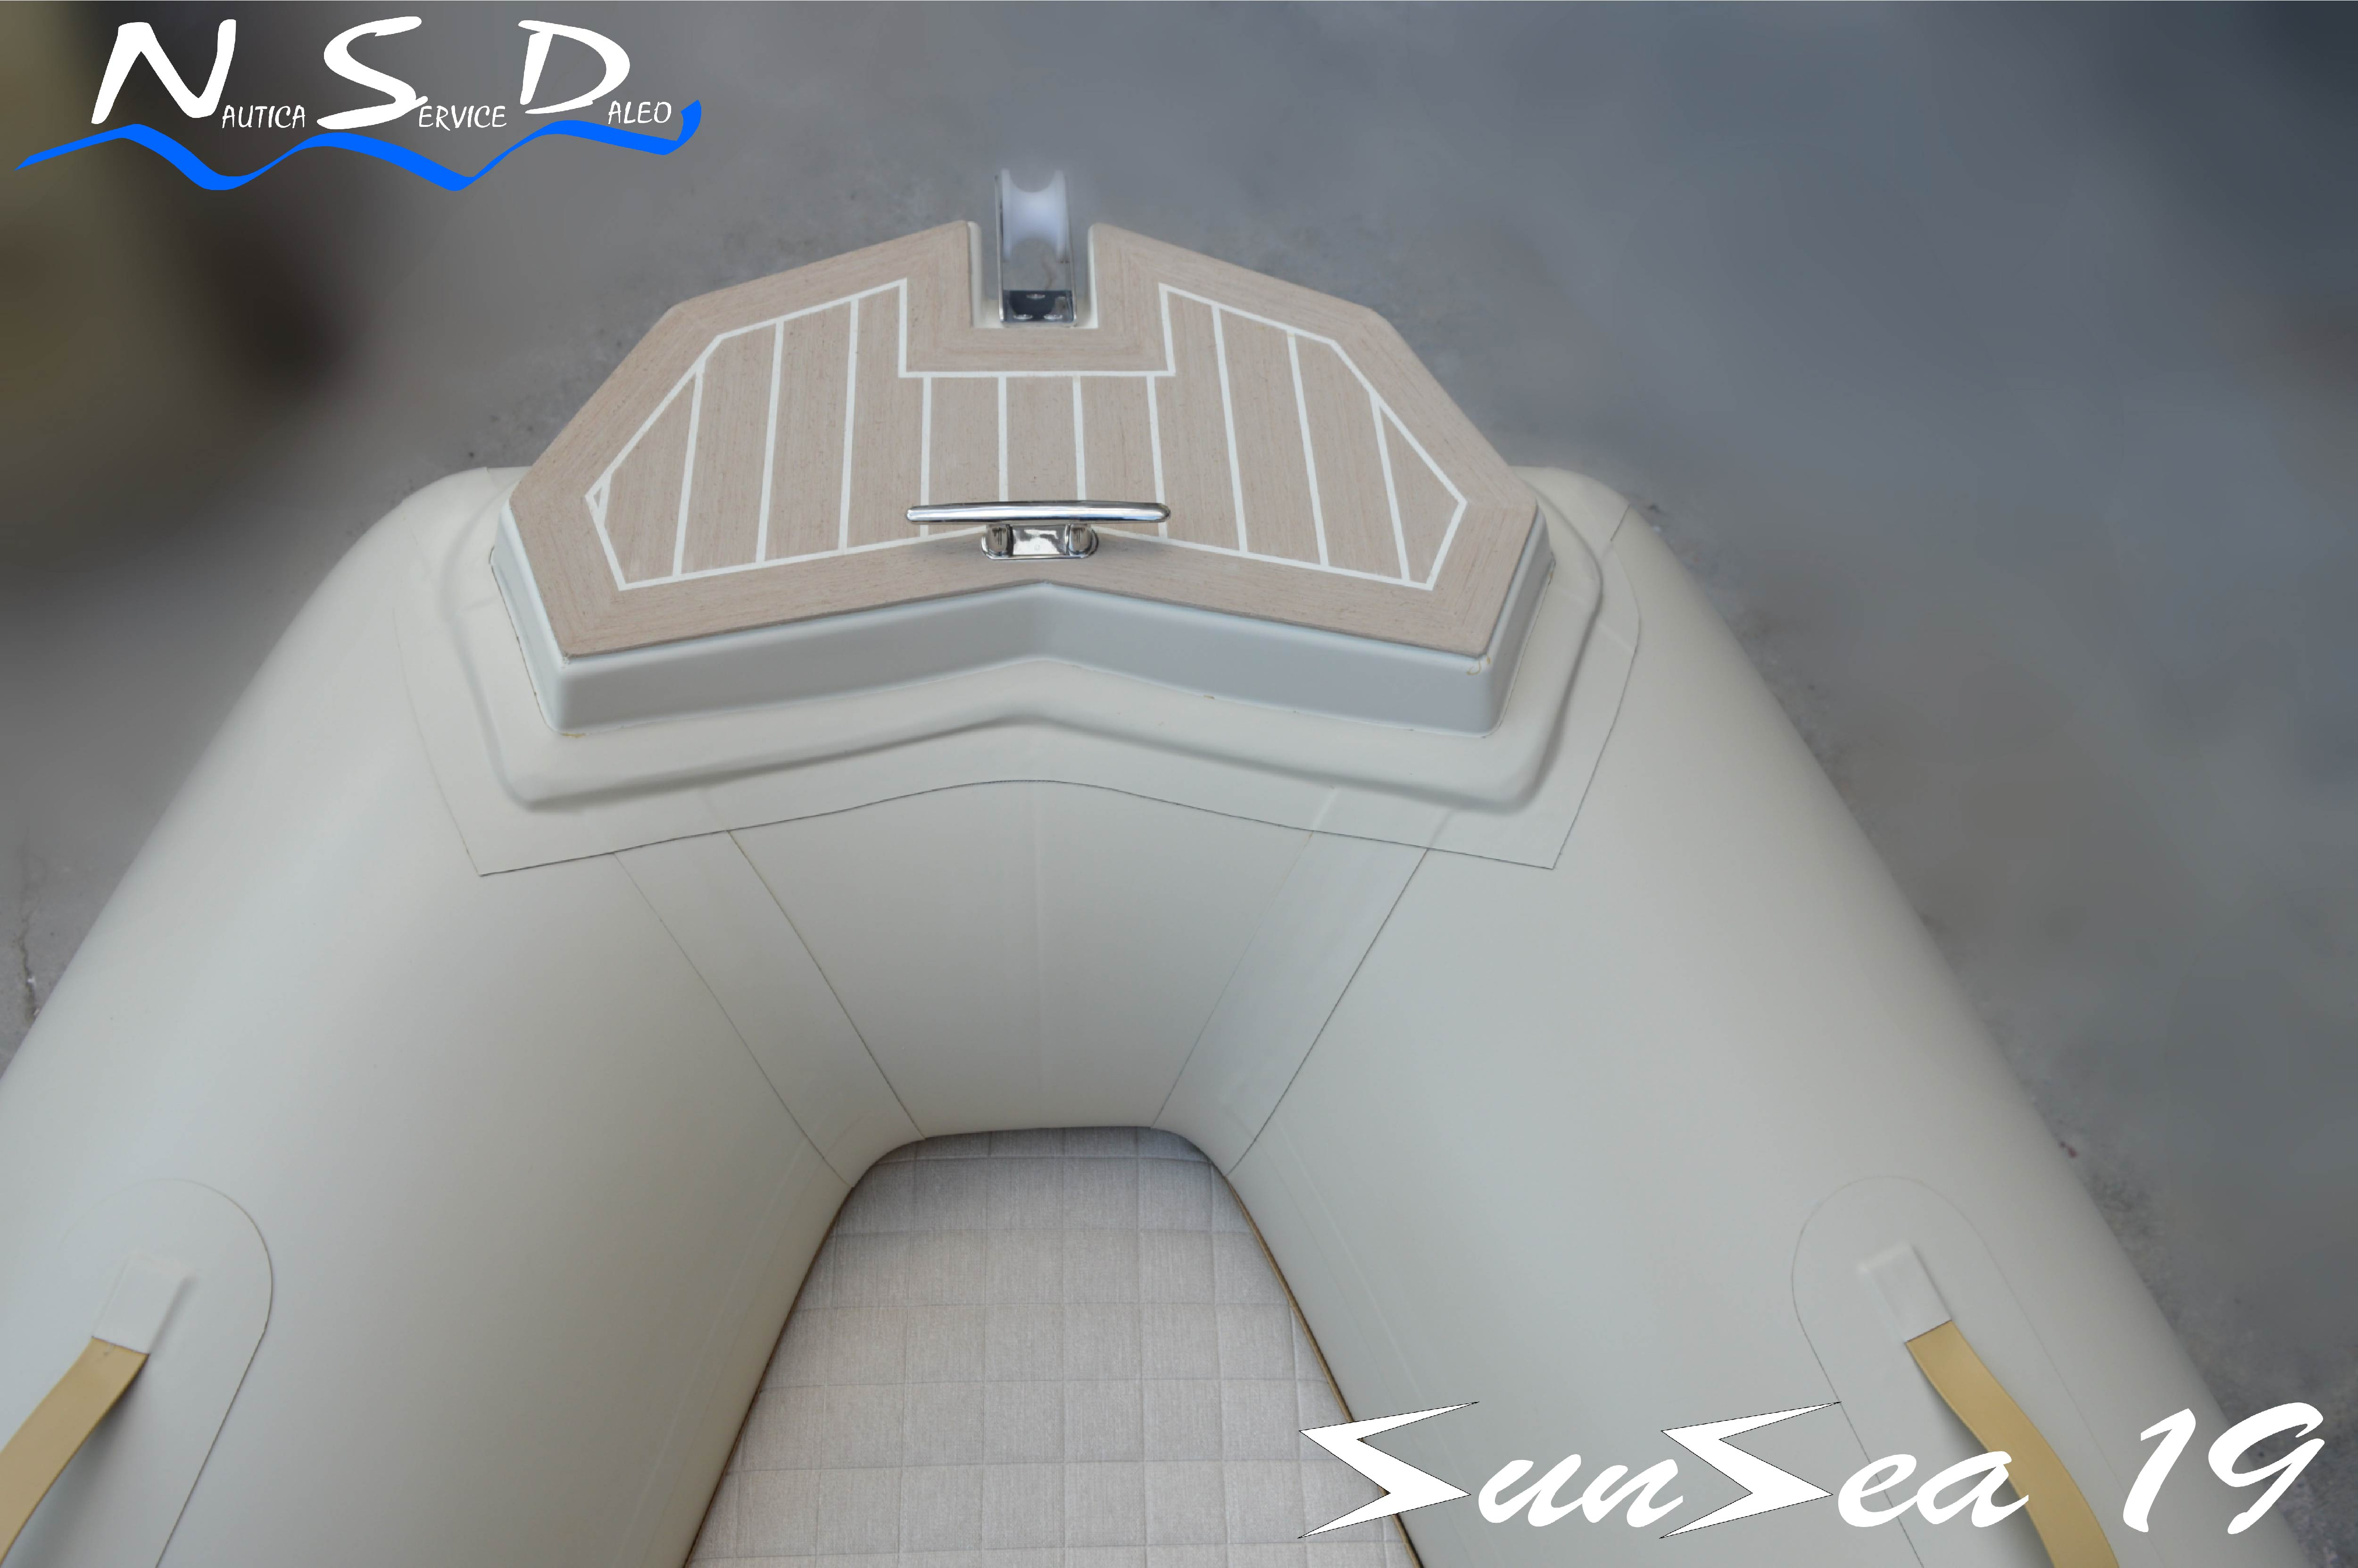 SUNSEA 19 BEIGE 2021 LOGATE (2)